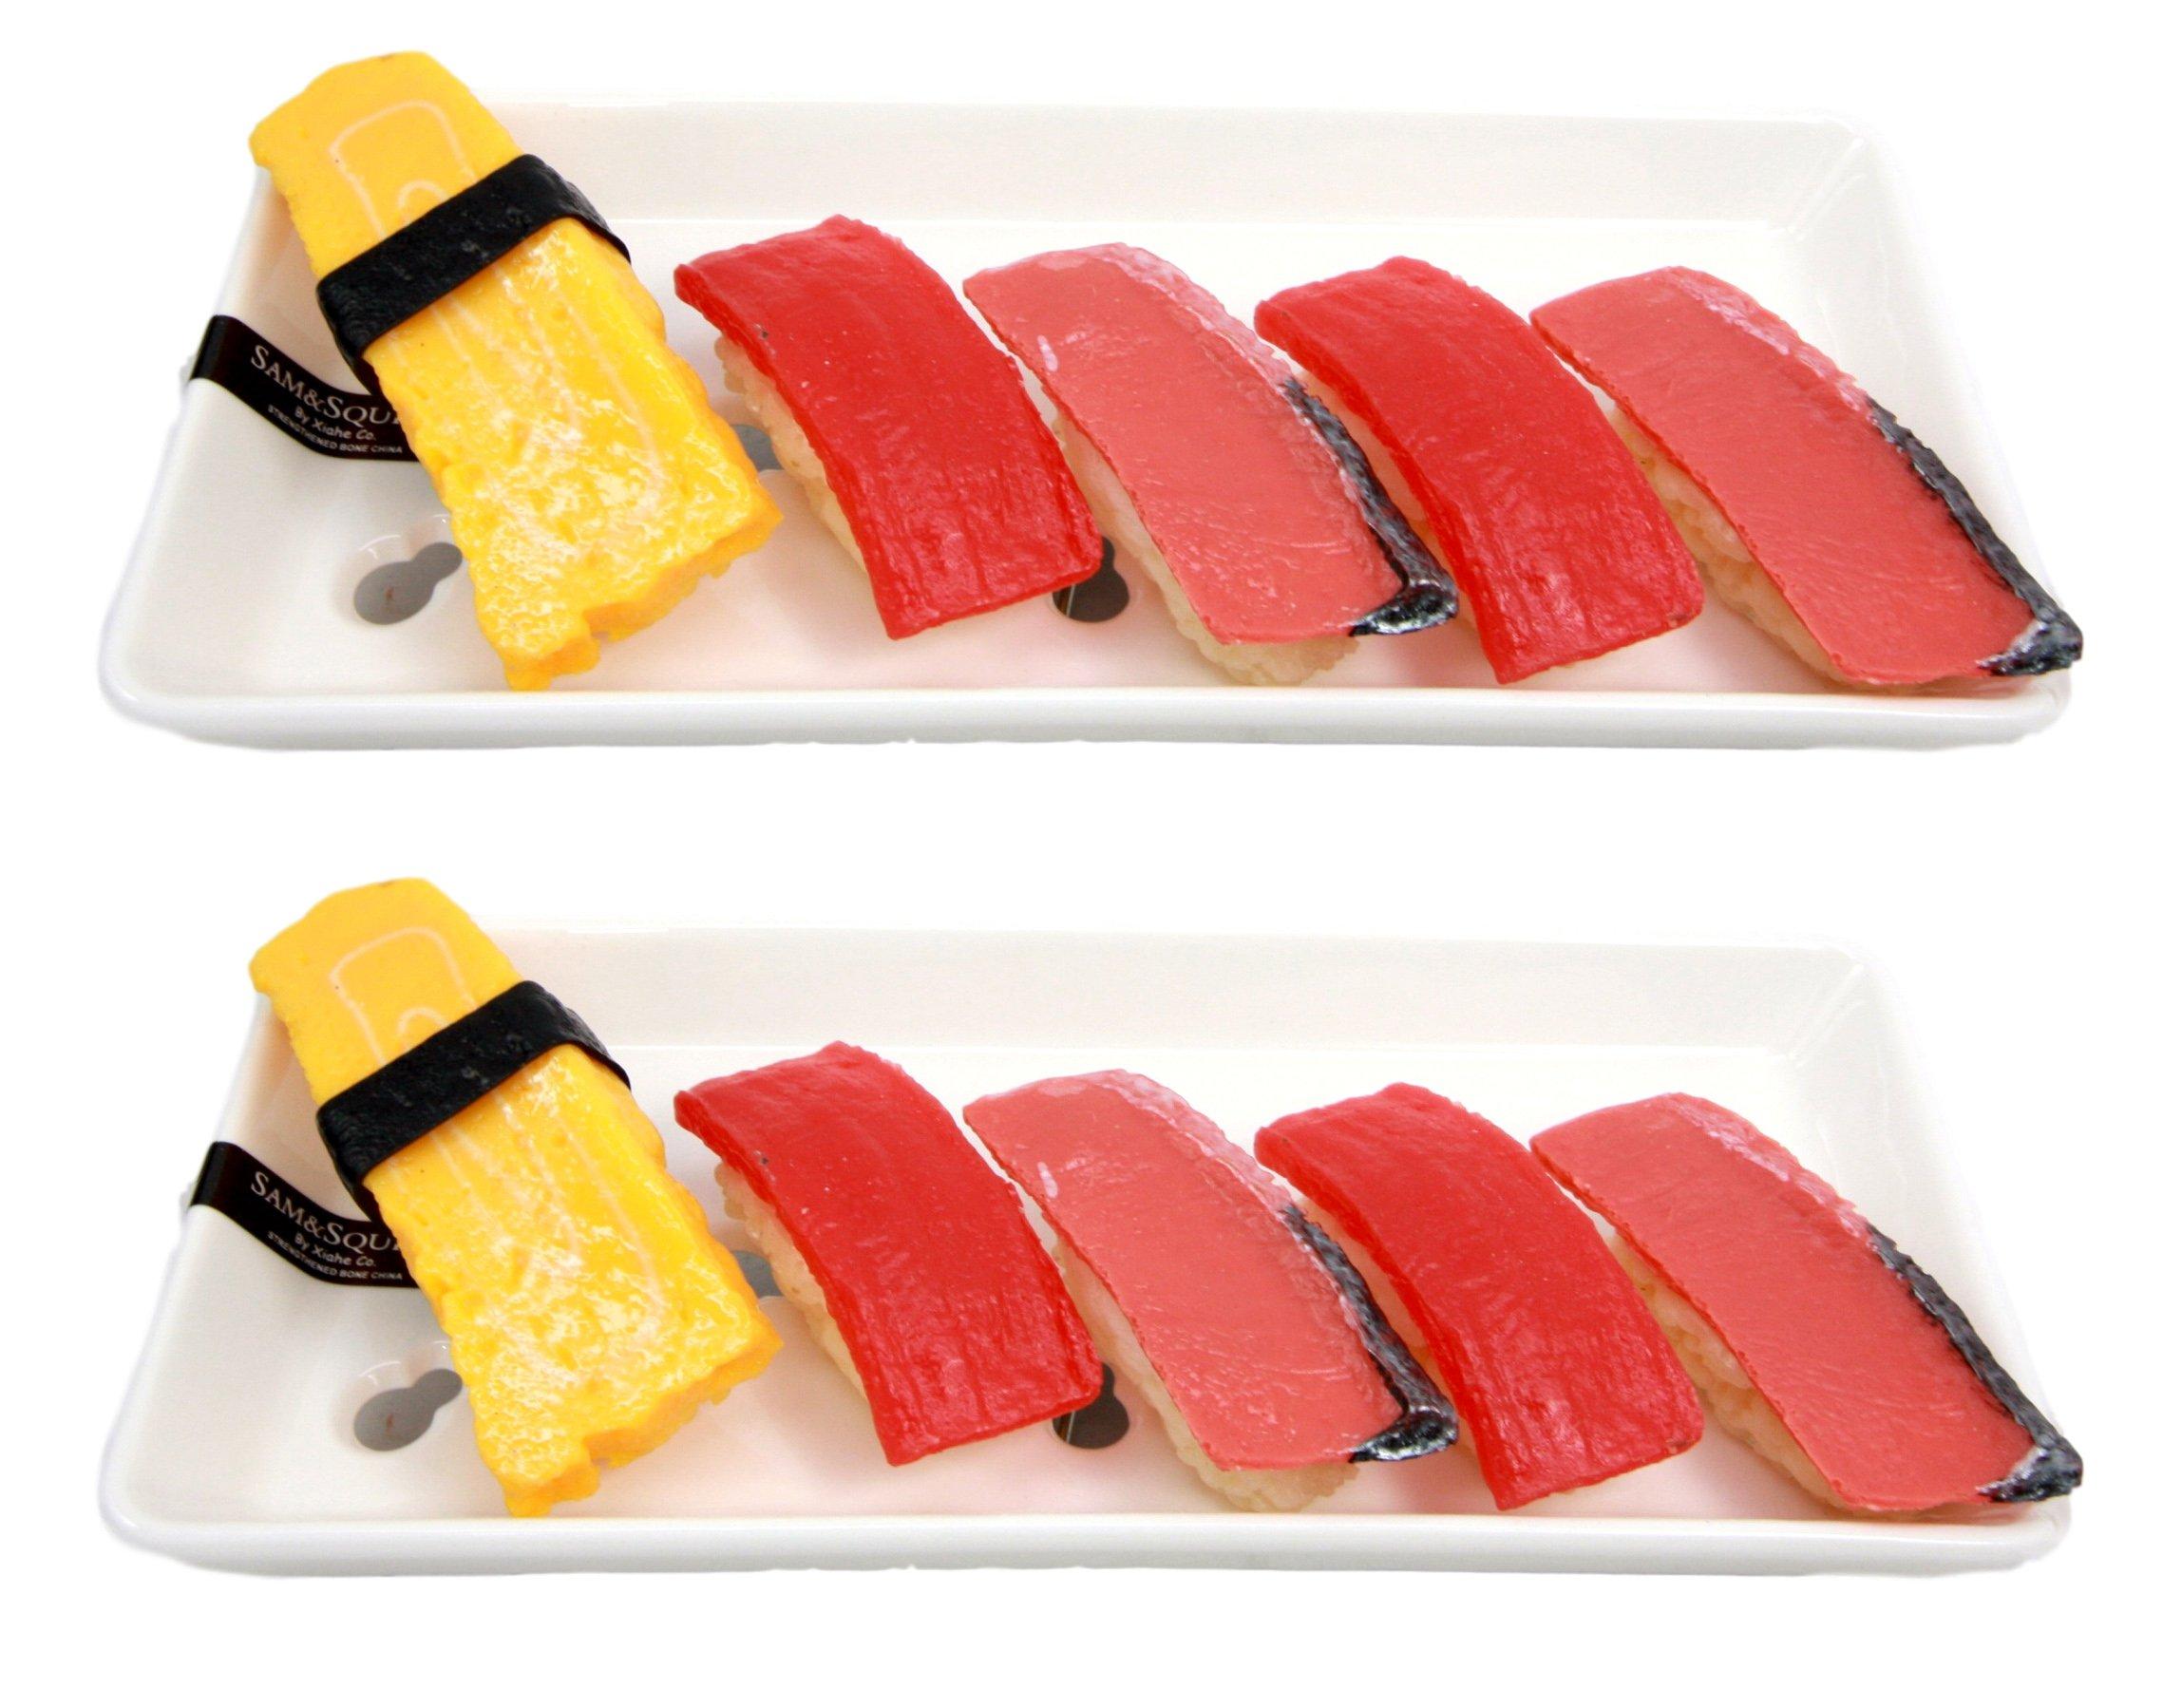 Atlantic Collectibles Set of 2 Japanese White Neta Zara Porcelain Sushi Sashimi Chef Serving Plate With Holes 8''L x 3.75''W